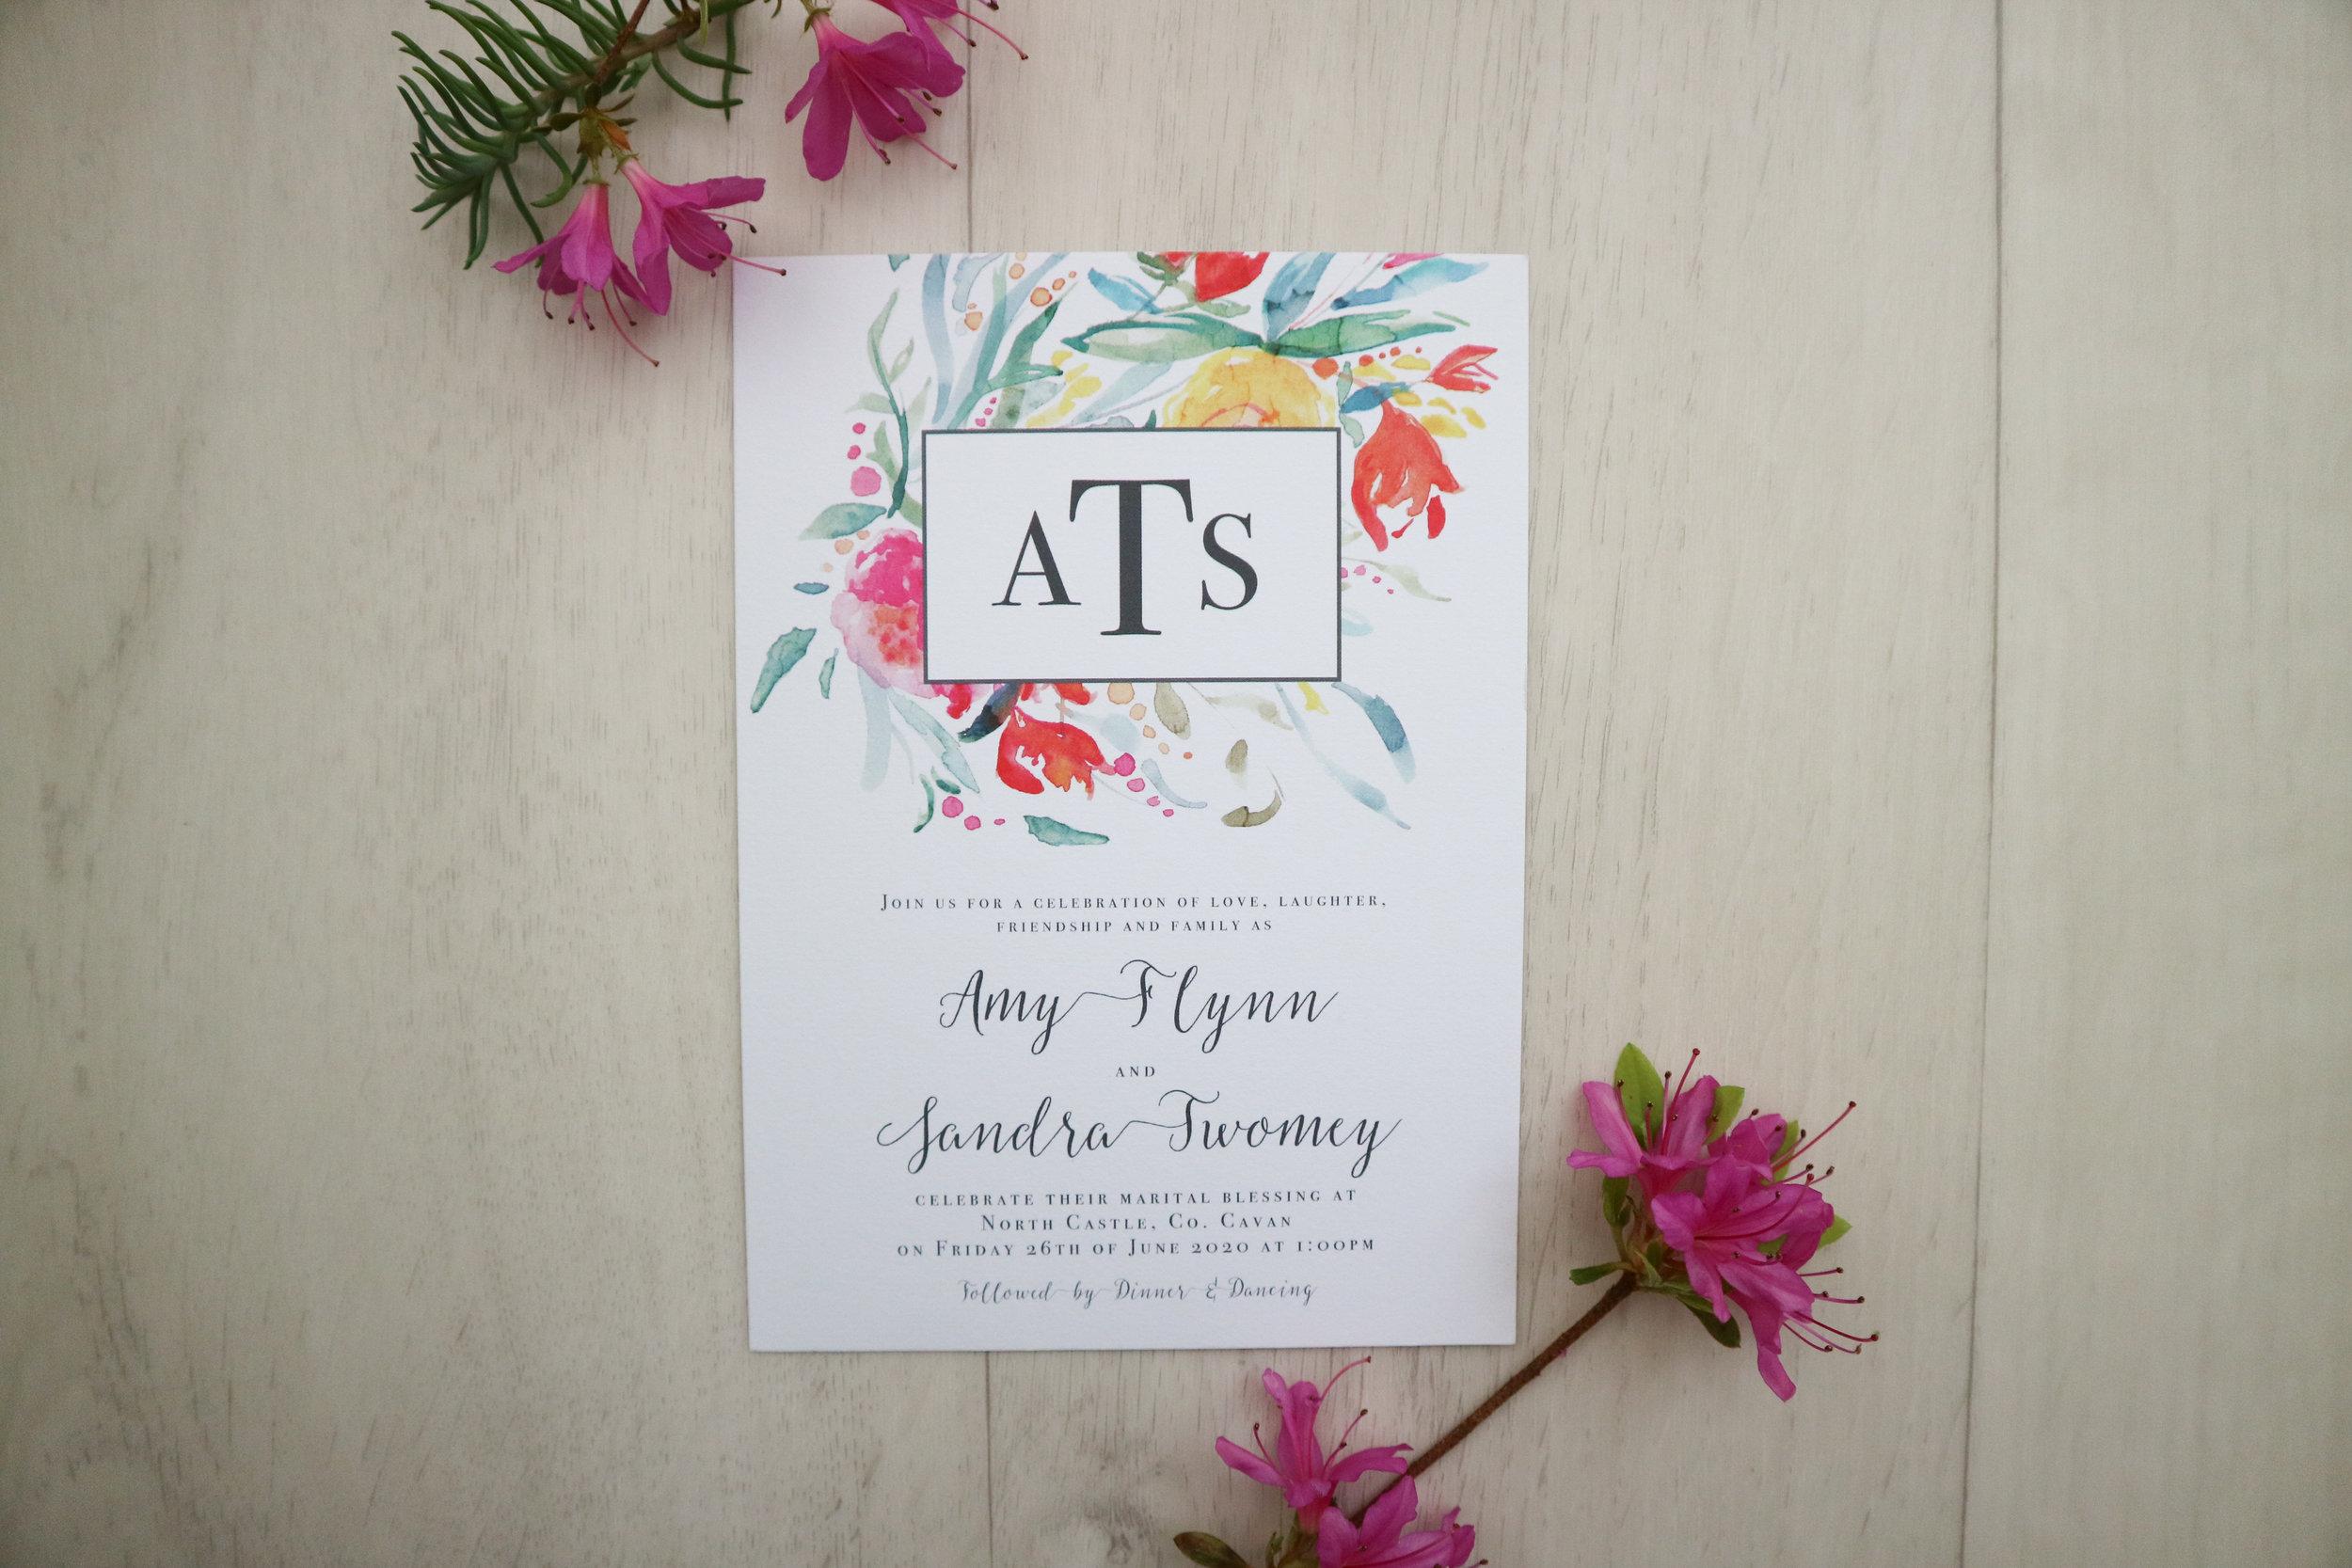 Little-Bow-Print-Wedding-Invitations-Waterford-Eden-photography-Boquet-Monogram-Confetti-13.jpg